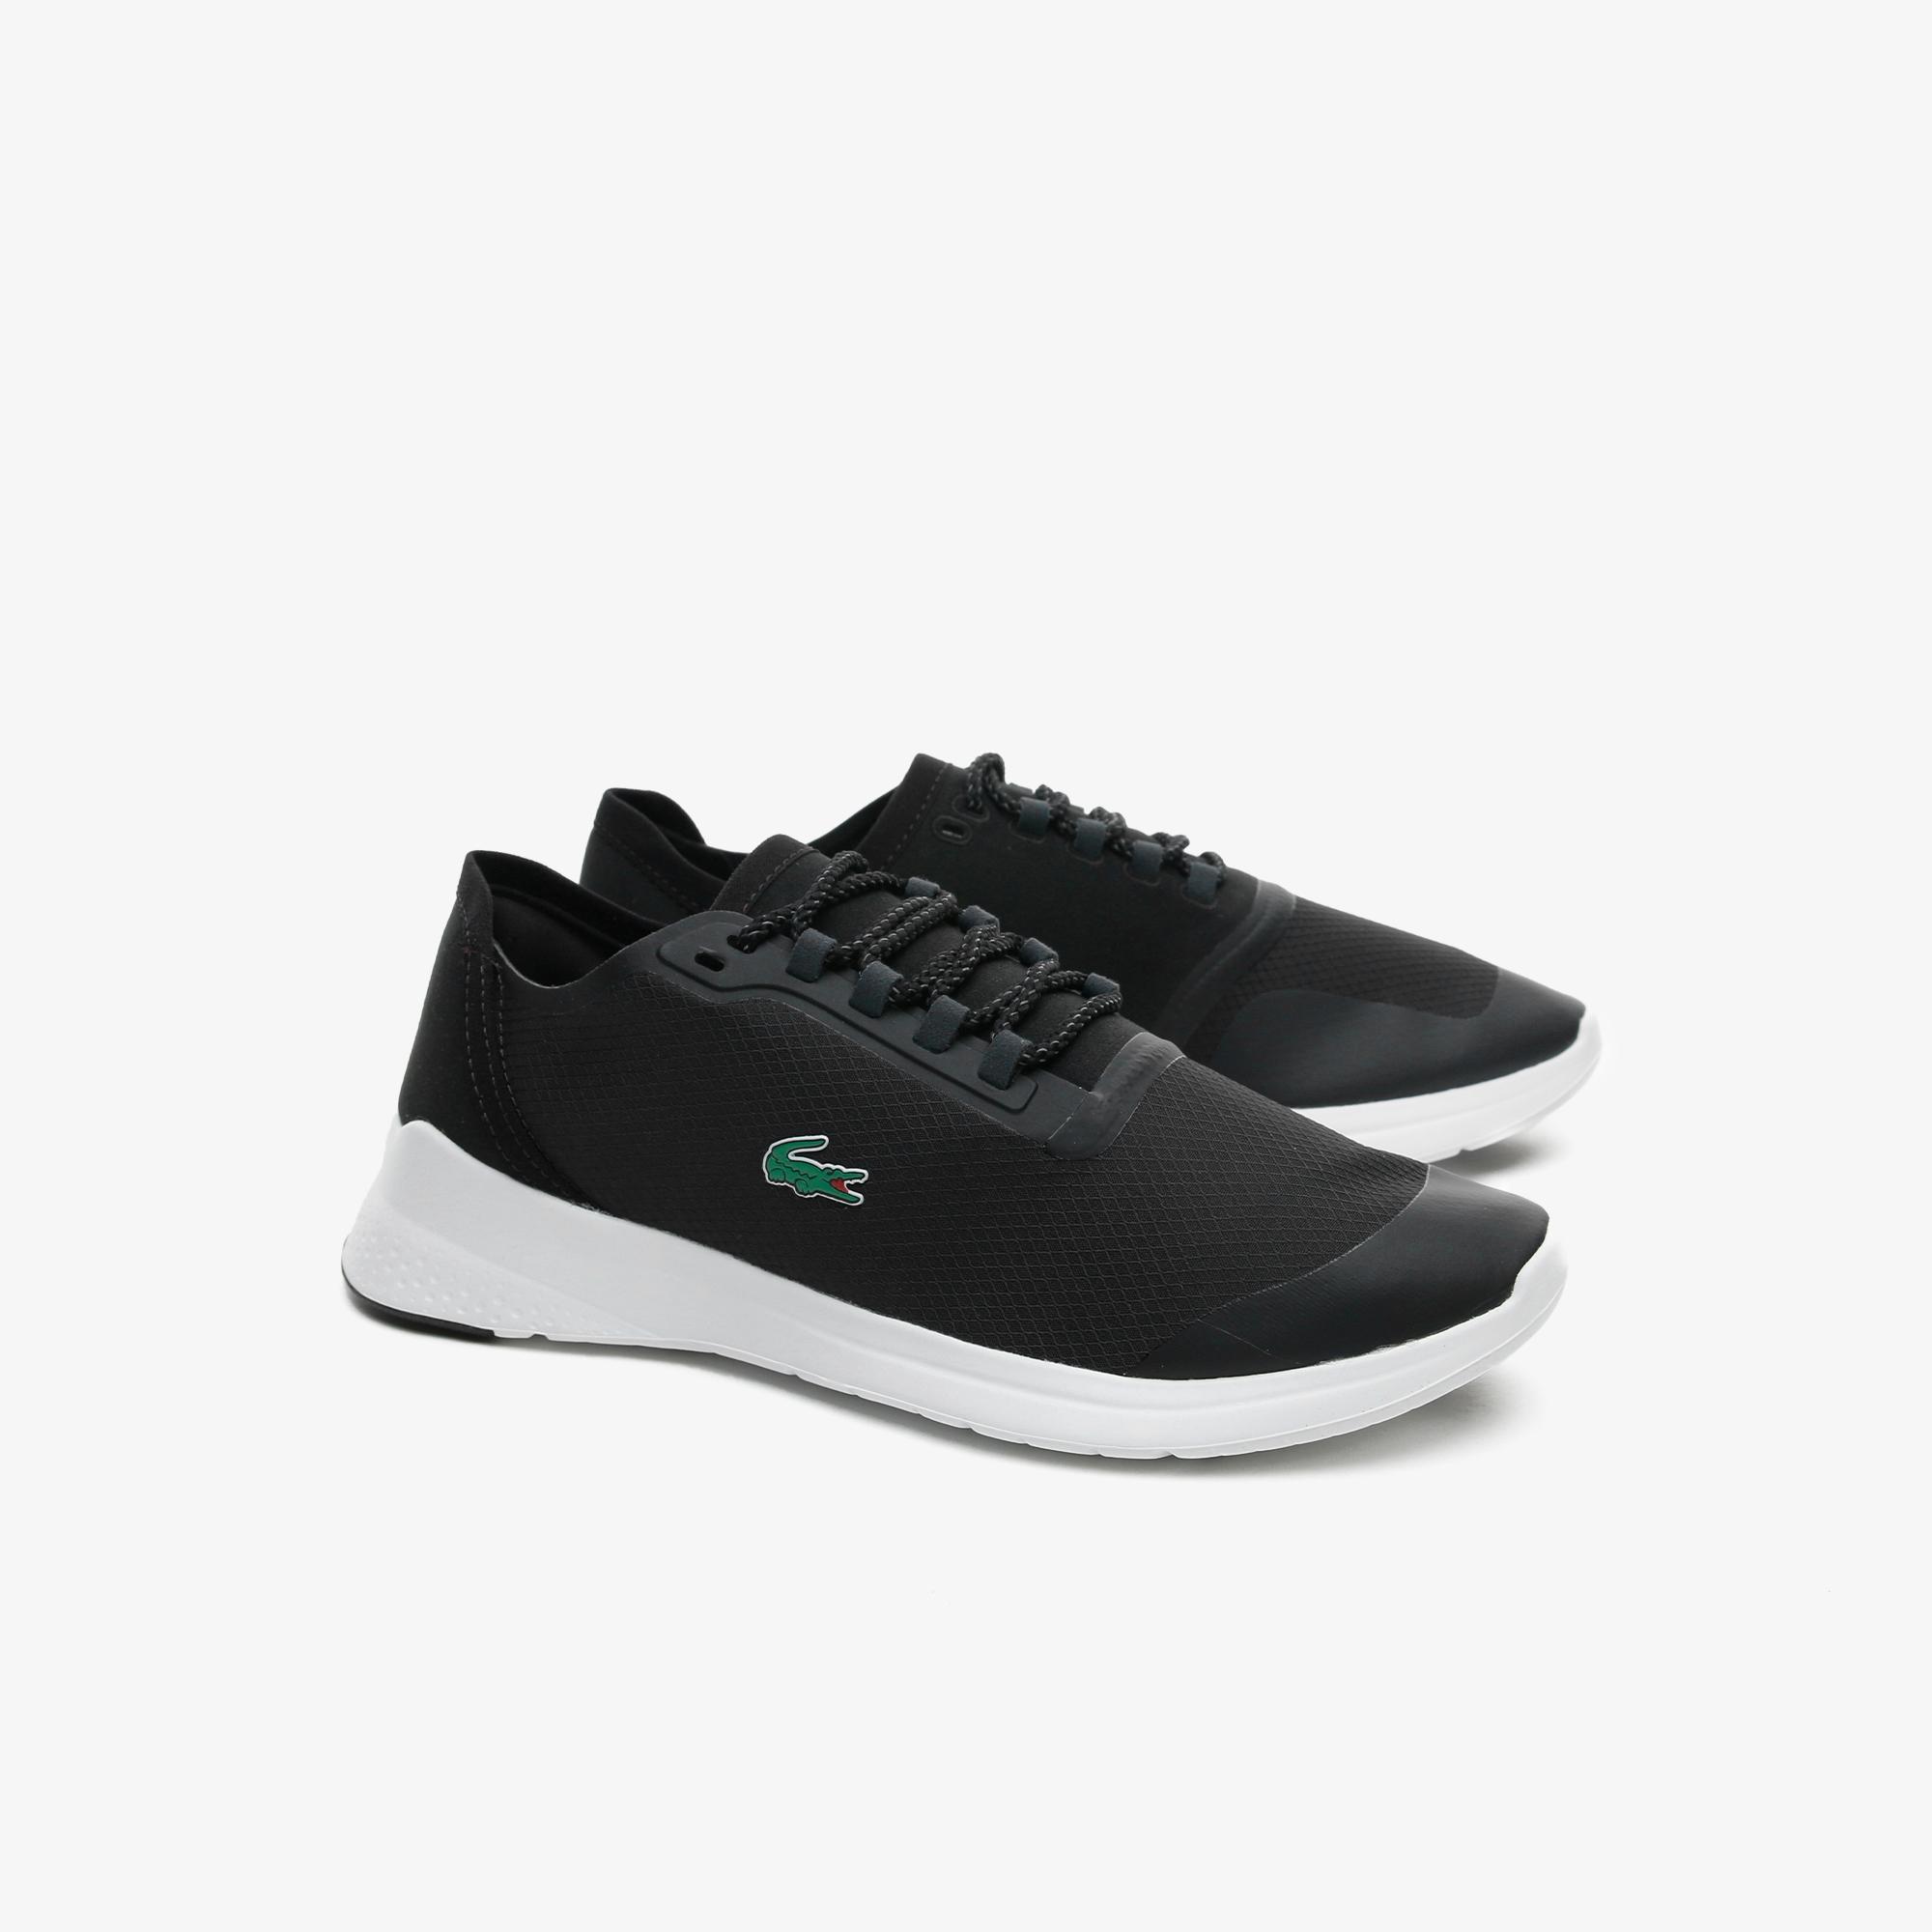 Lacoste Lt Fit 0721 1 Sma Erkek Siyah - Beyaz Sneaker